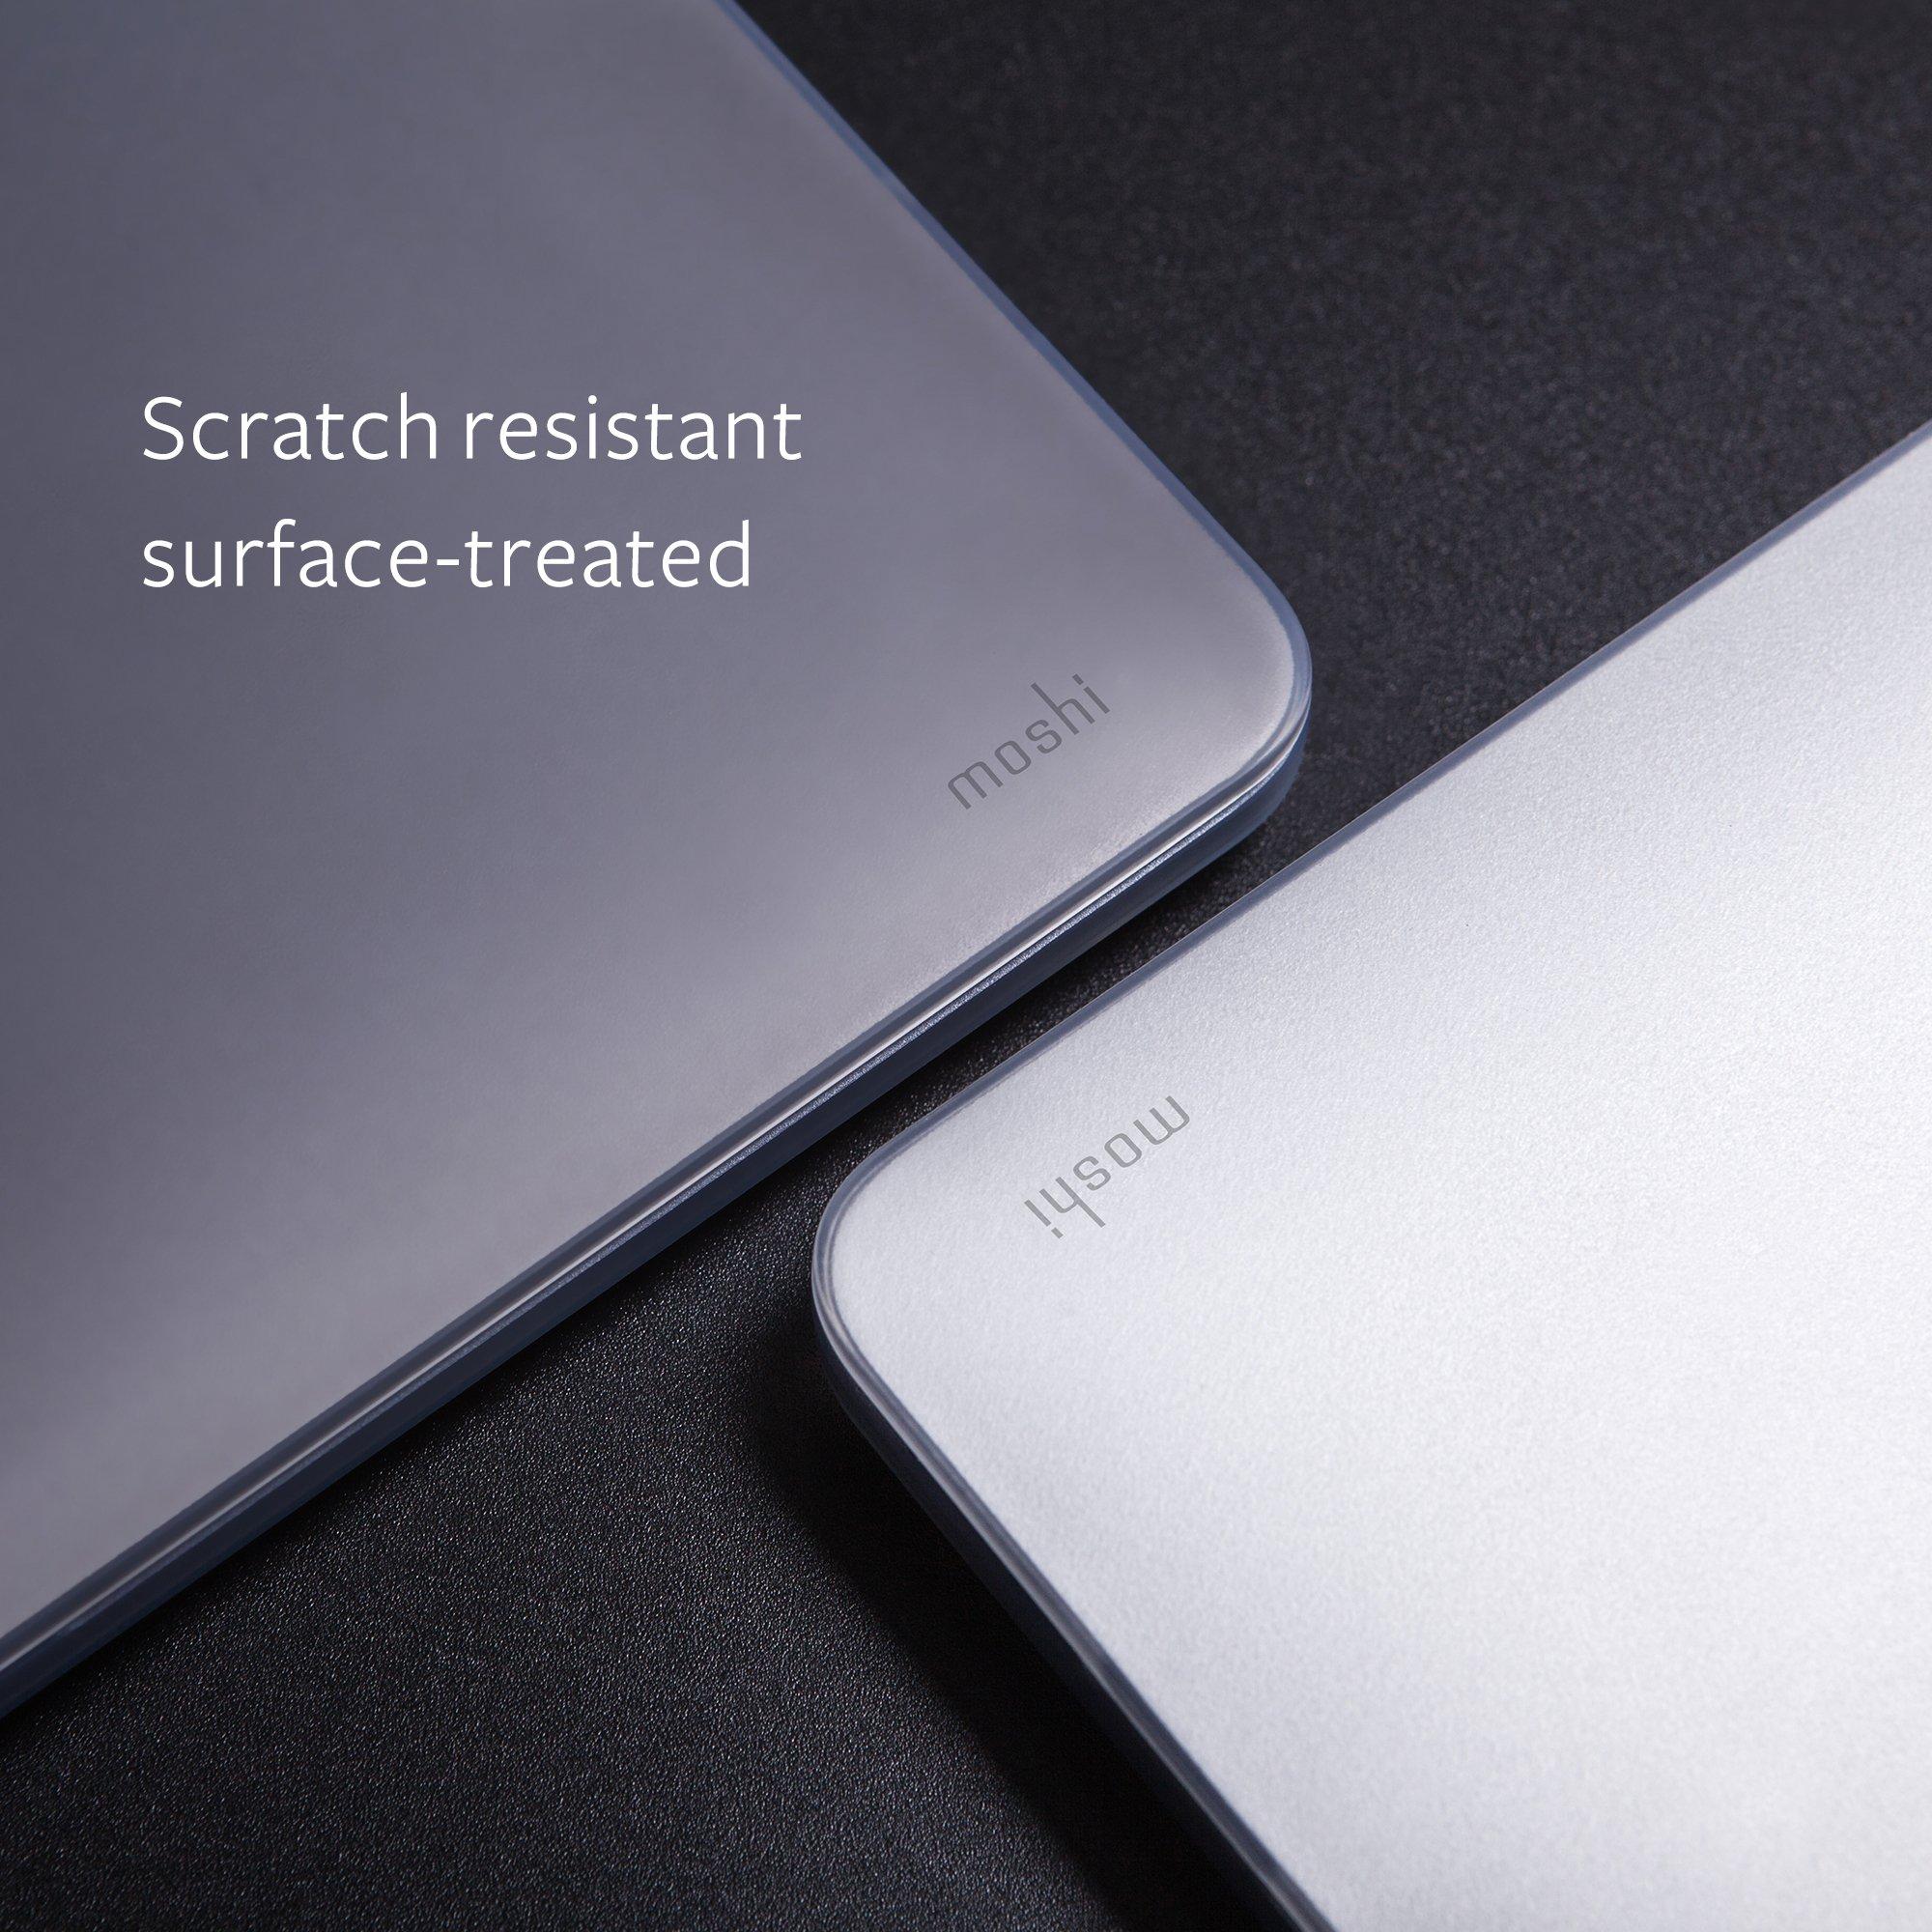 Moshi 99MO071006 iGlaze Hard Case for 2018 New MacBook Pro Retina 15'' & Thunderbolt 3 with Touch Bar, Stealth Black by Moshi (Image #5)